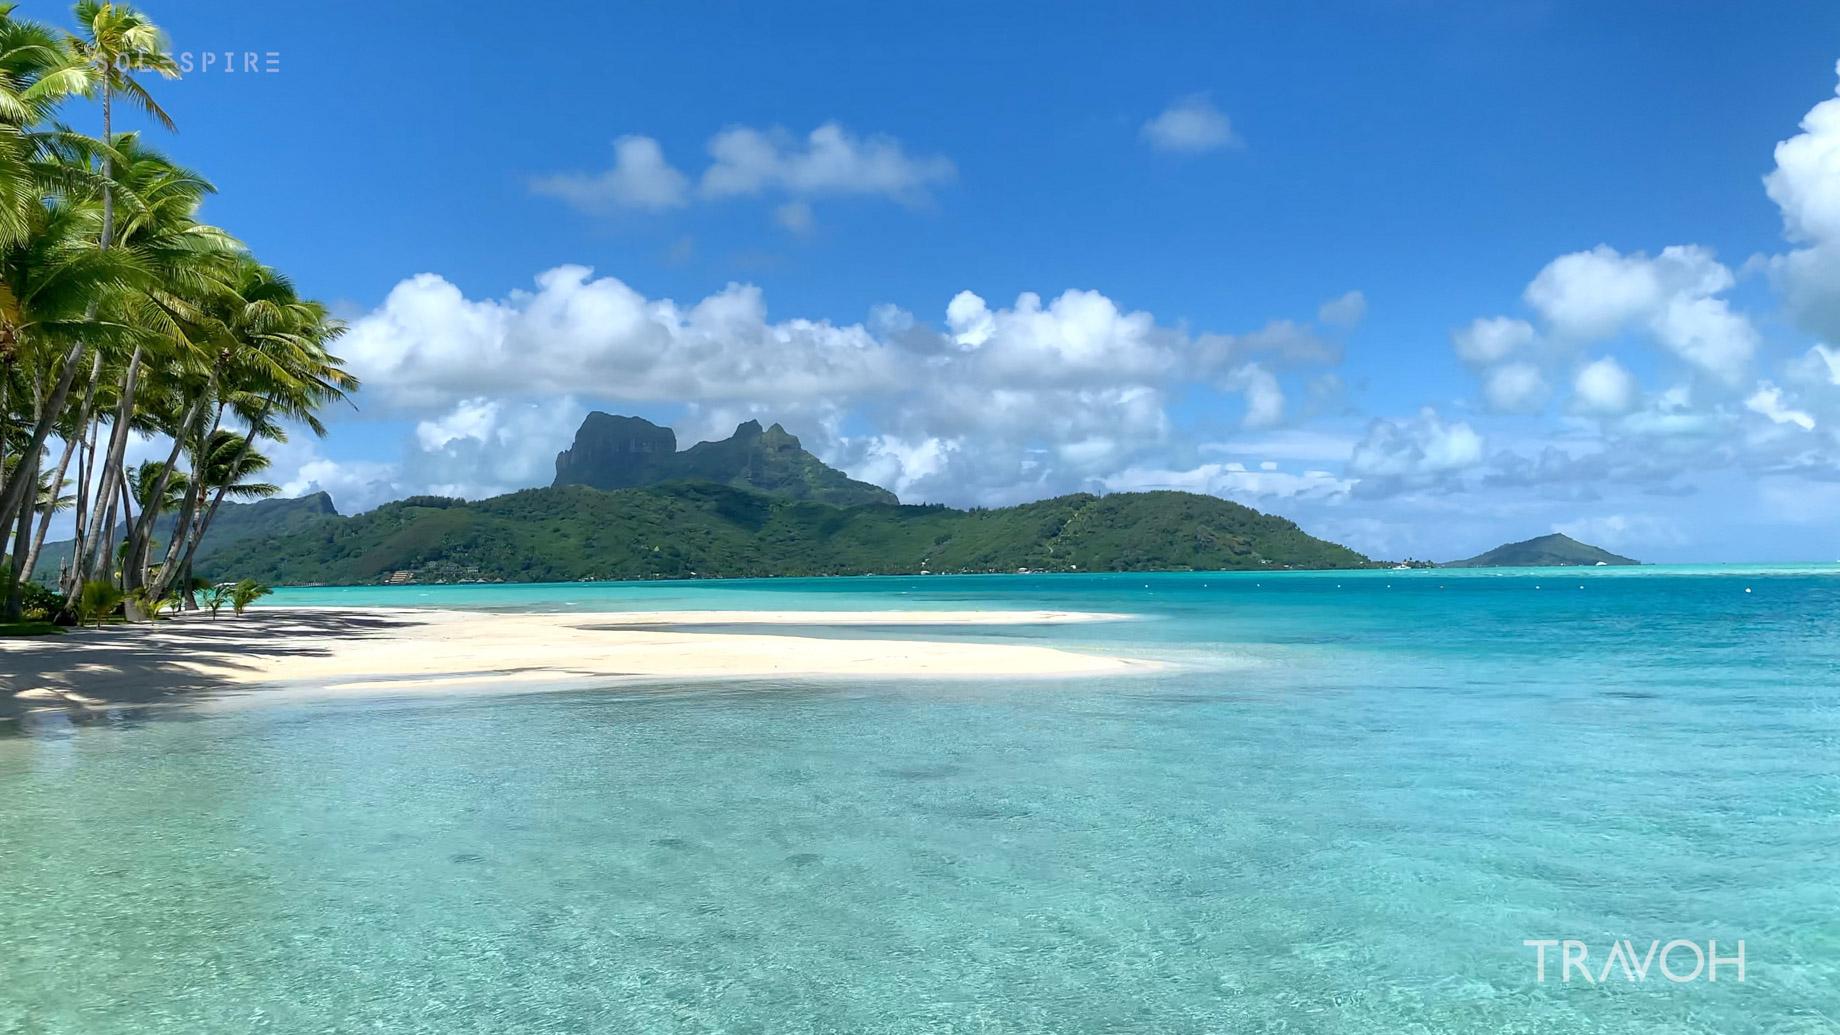 Arrival – Motu Tane Private Island Vacation – Bora Bora, French Polynesia – Travel